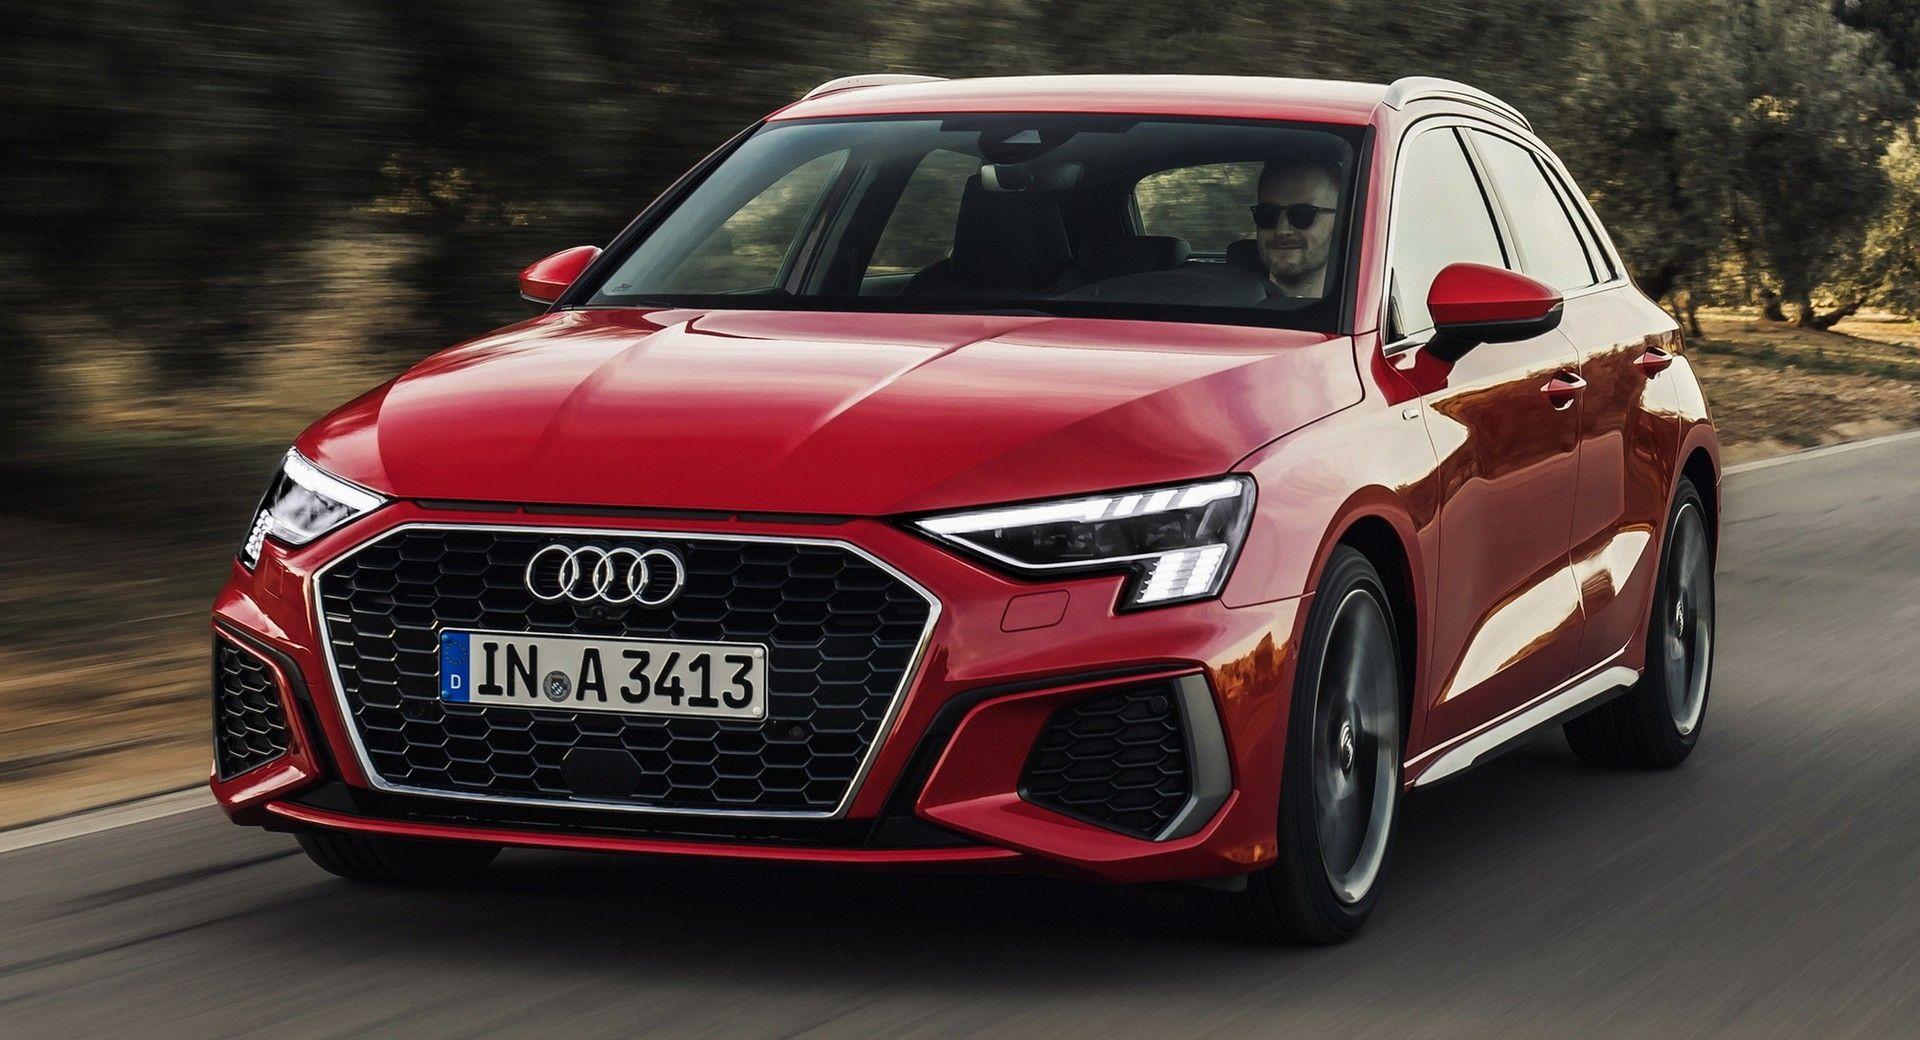 2020 Audi A5 New Review Audi a5, Audi, Audi a3